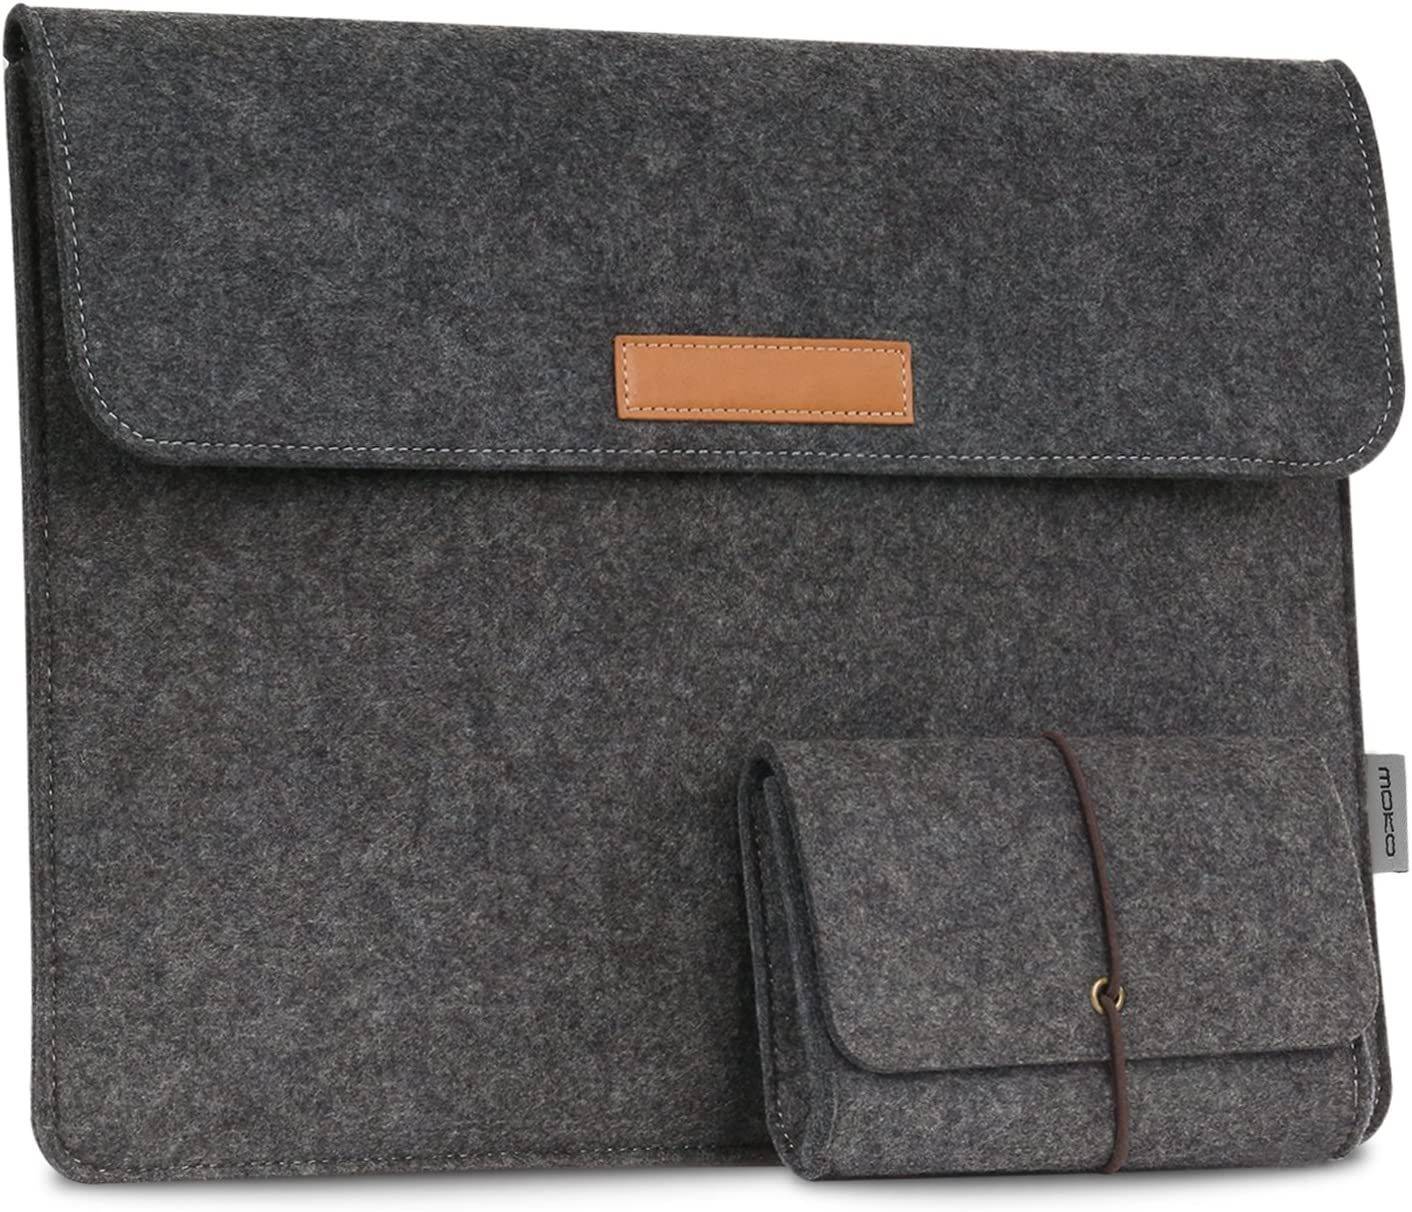 MoKo 12 Inch Laptop Felt Sleeve Bag, Protective Case Cover Fit Microsoft Surface Pro 7/Pro 6/Pro 5/Pro 4/Pro 3/Pro LTE 12.3